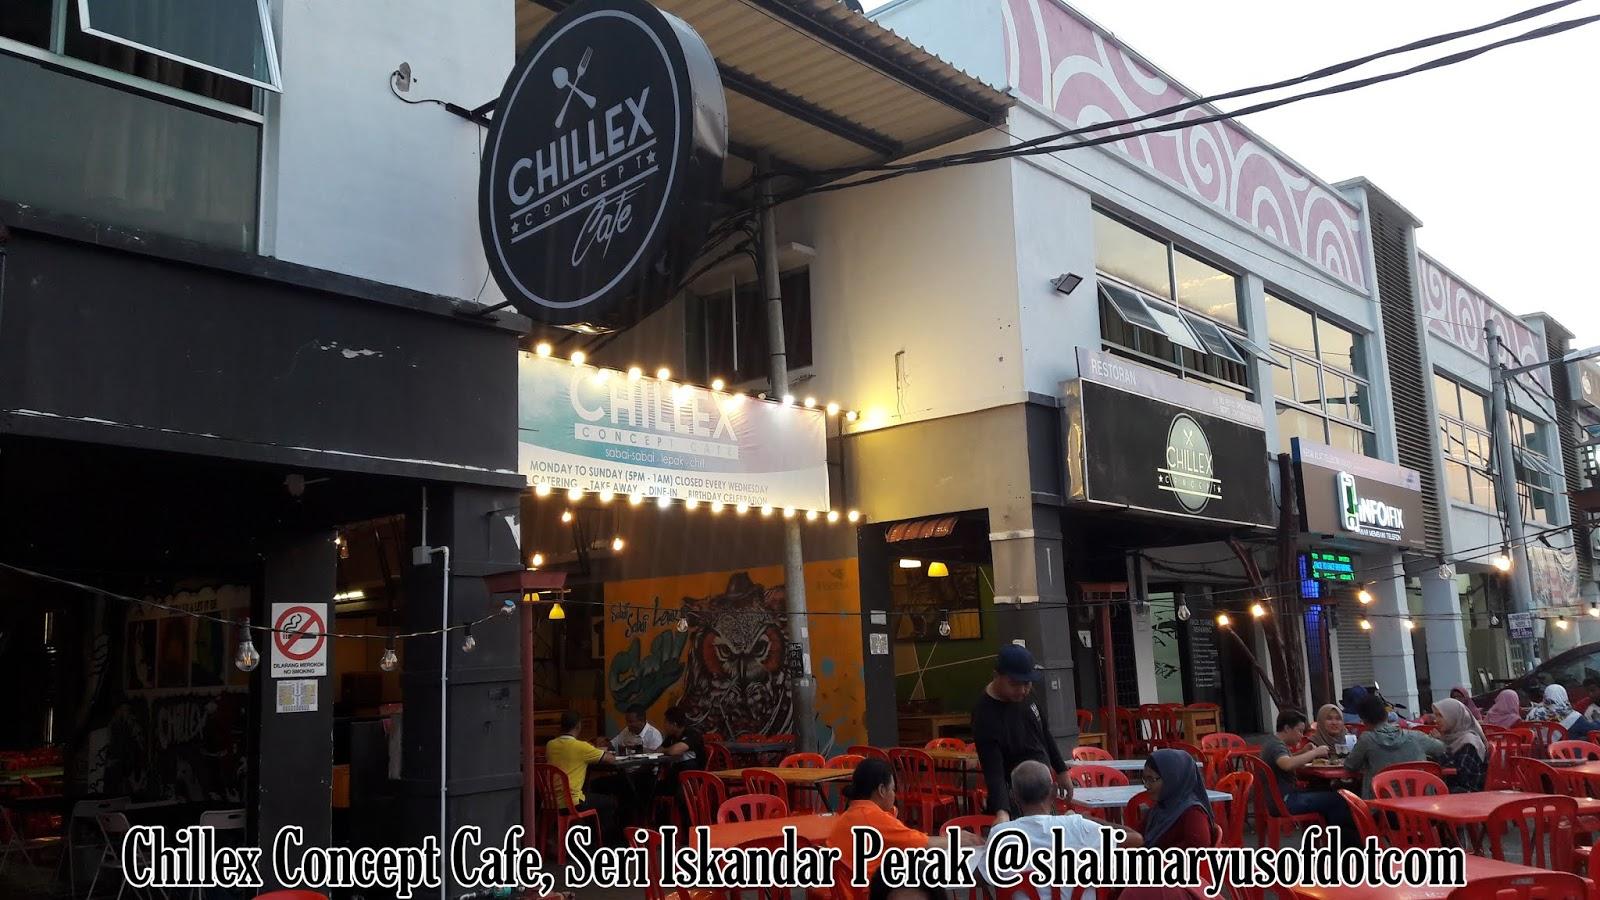 Masakan Western Chillex Concept Cafe Seri Iskandar Perak Masyuk Ke Tak Masyukk?